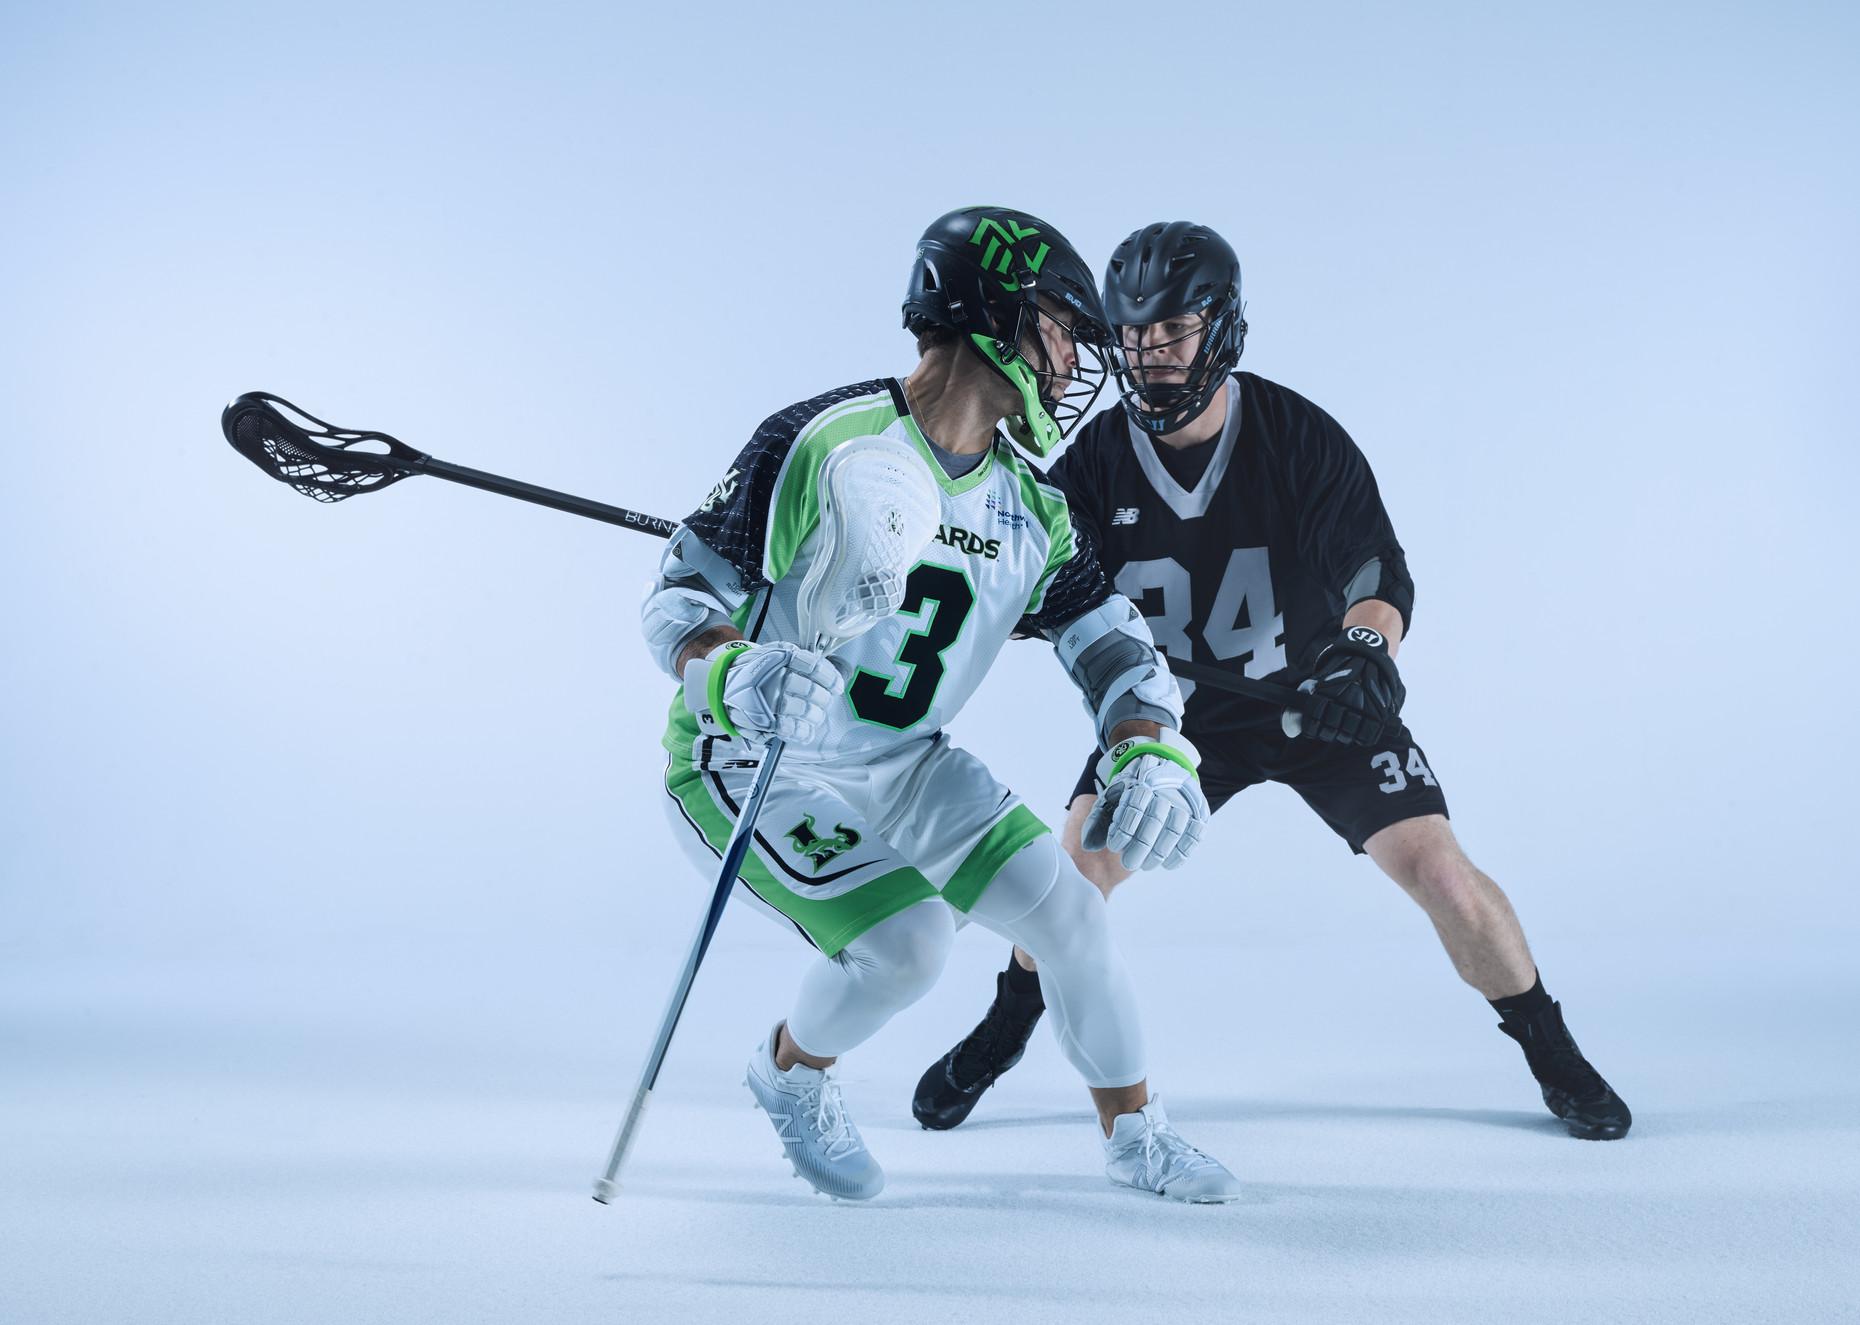 Sports photographer JJ Miller